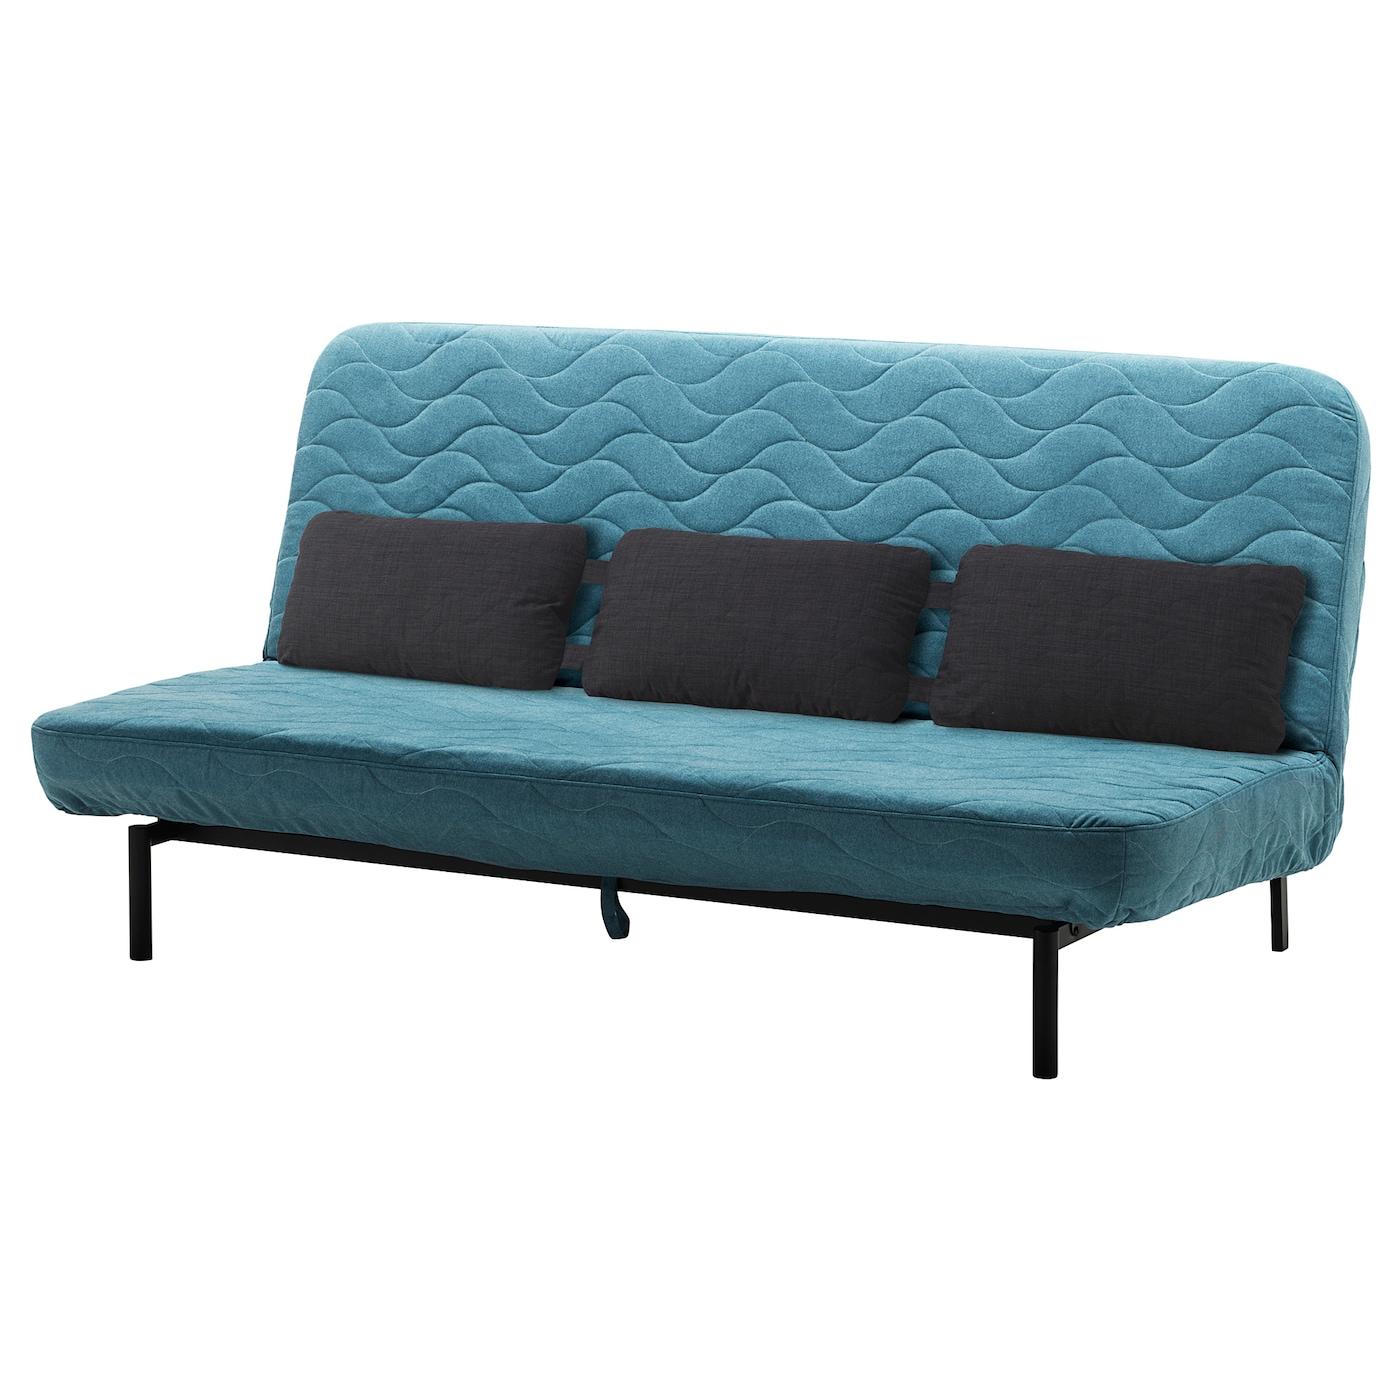 Sofa beds ikea ireland dublin for Spring sofa bed